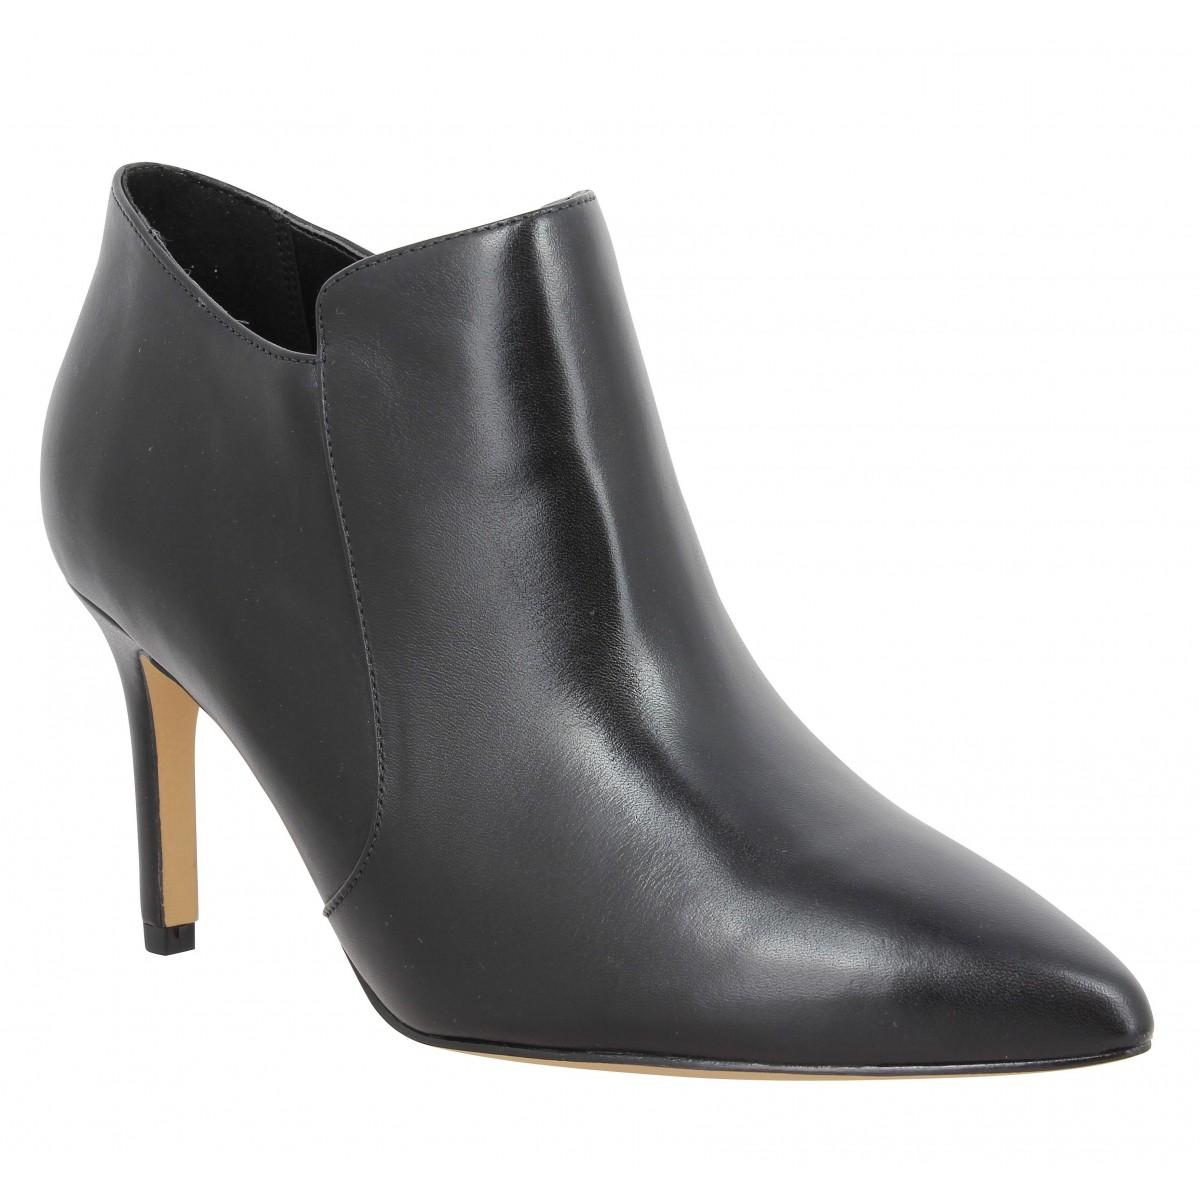 Bottines CLARKS Dinah Spice cuir Femme Noir